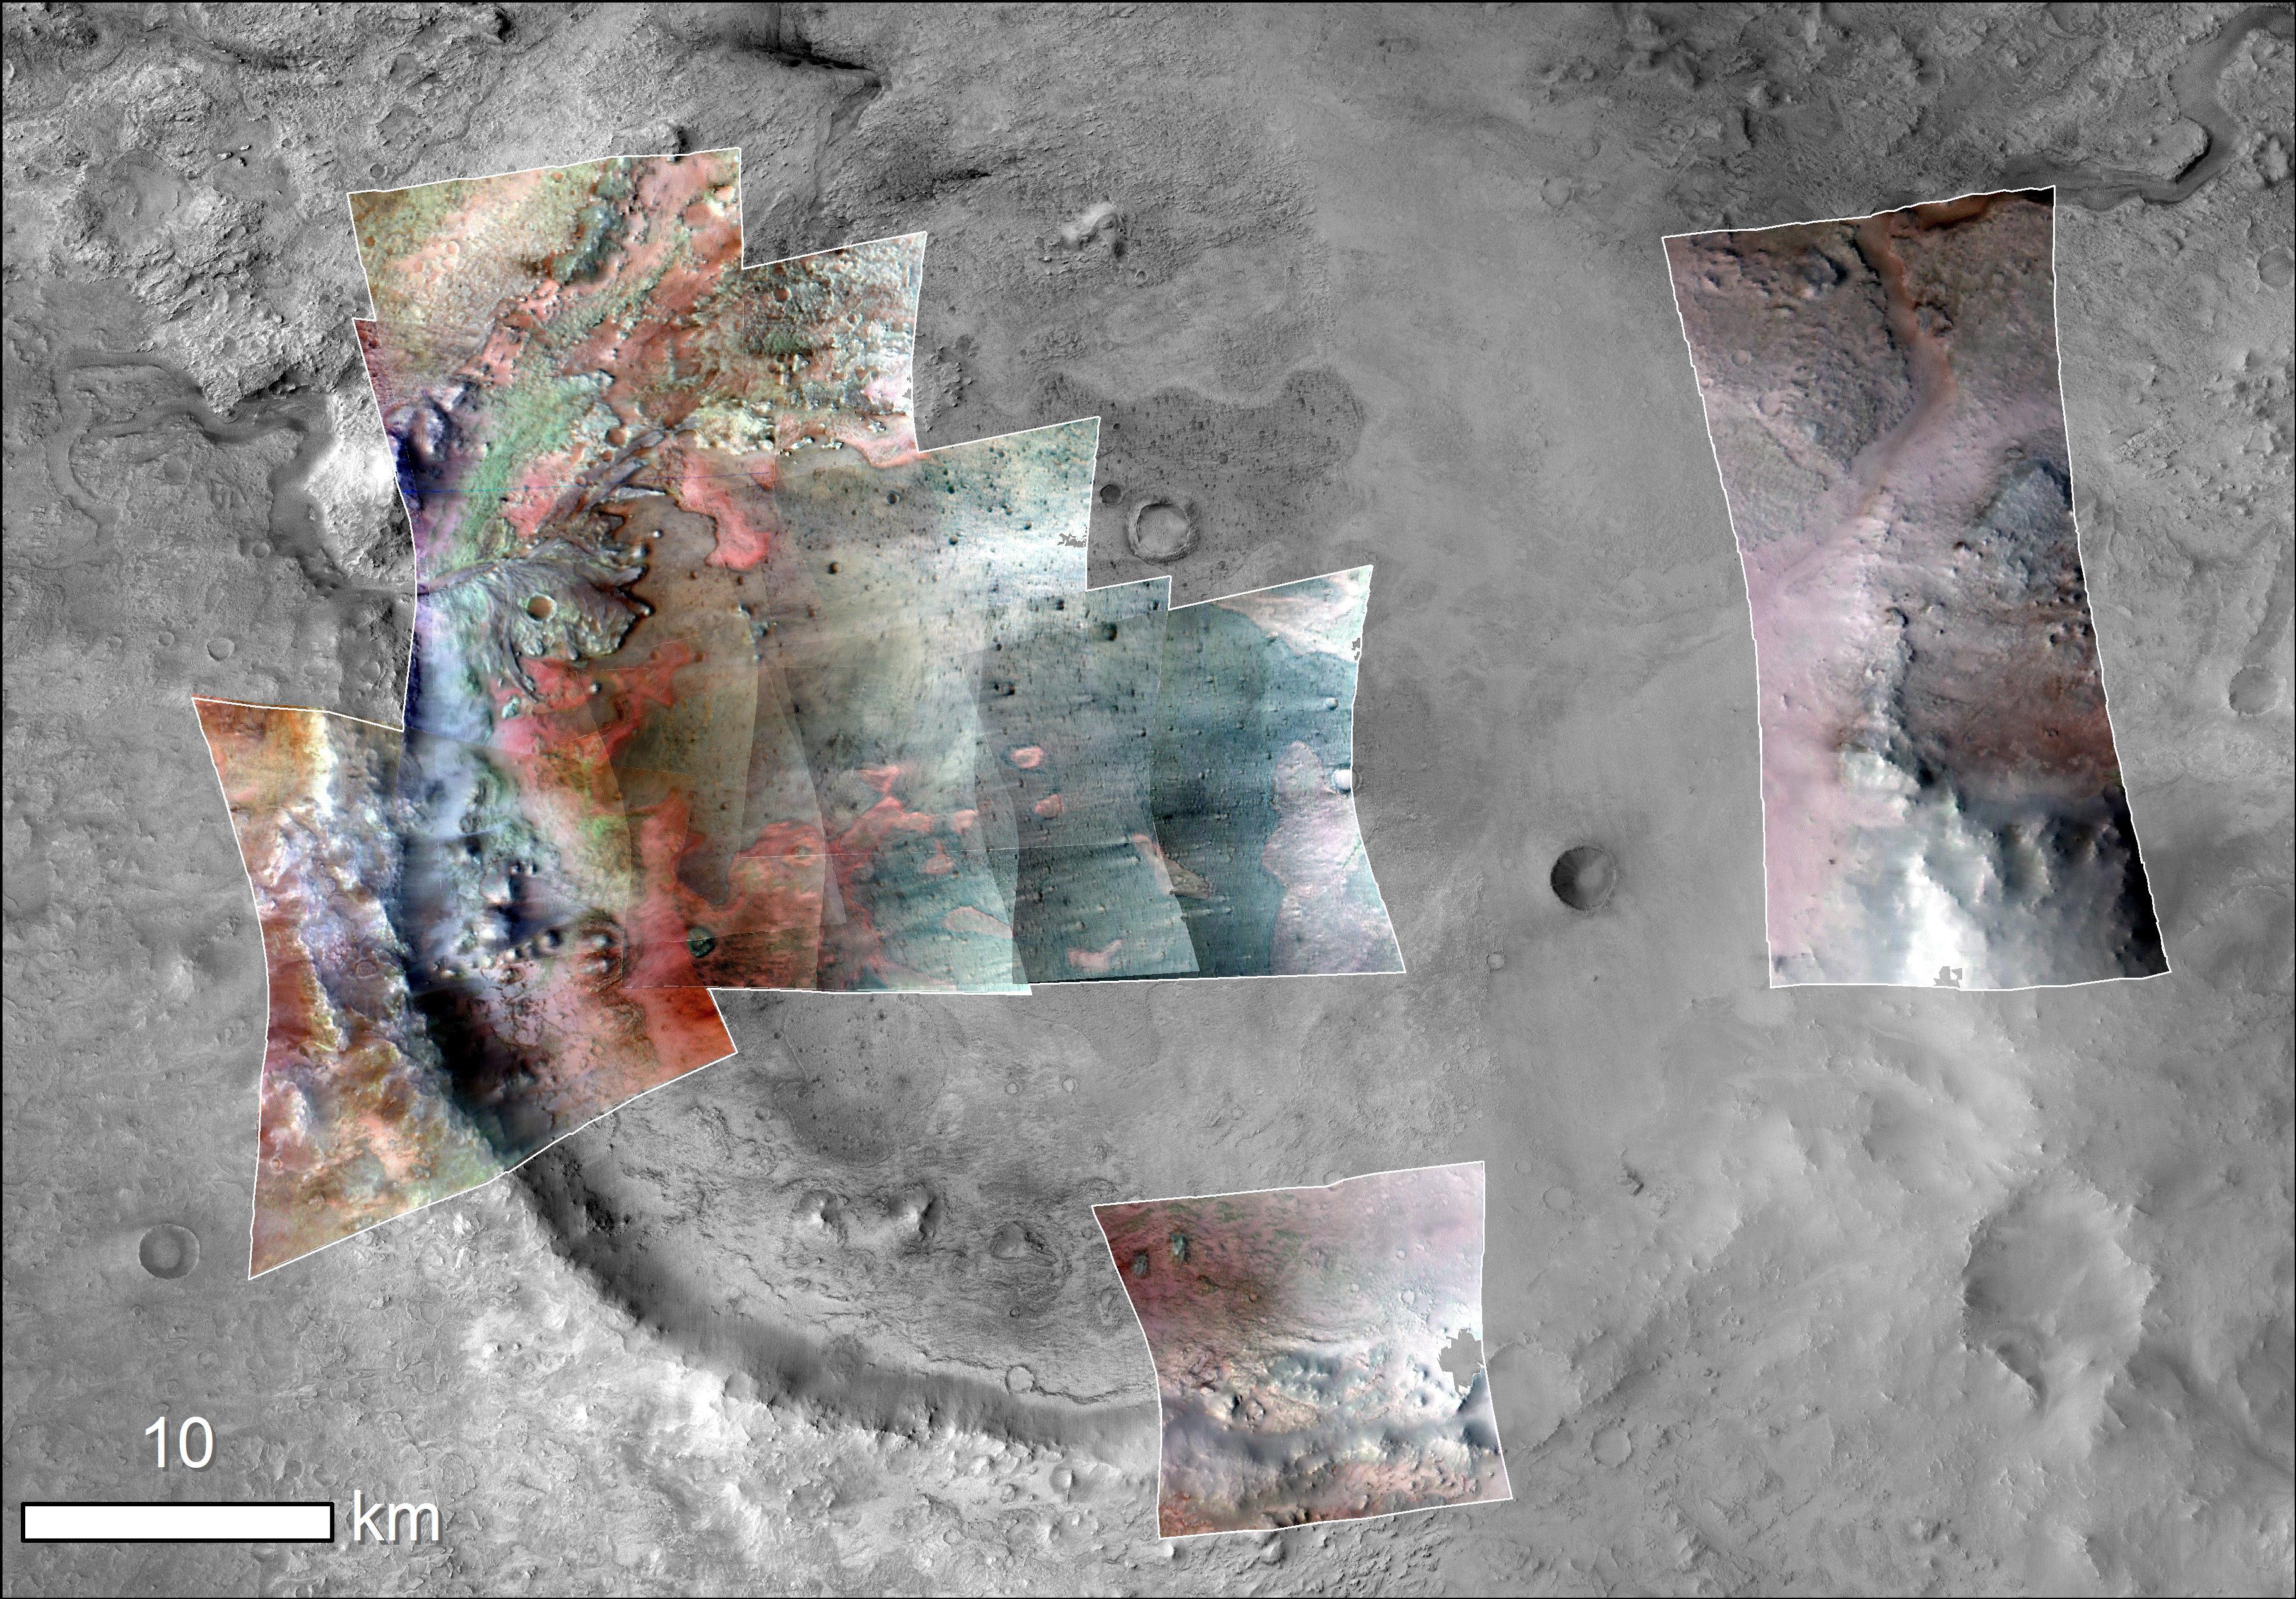 Jezero_crater_minerals.jpg